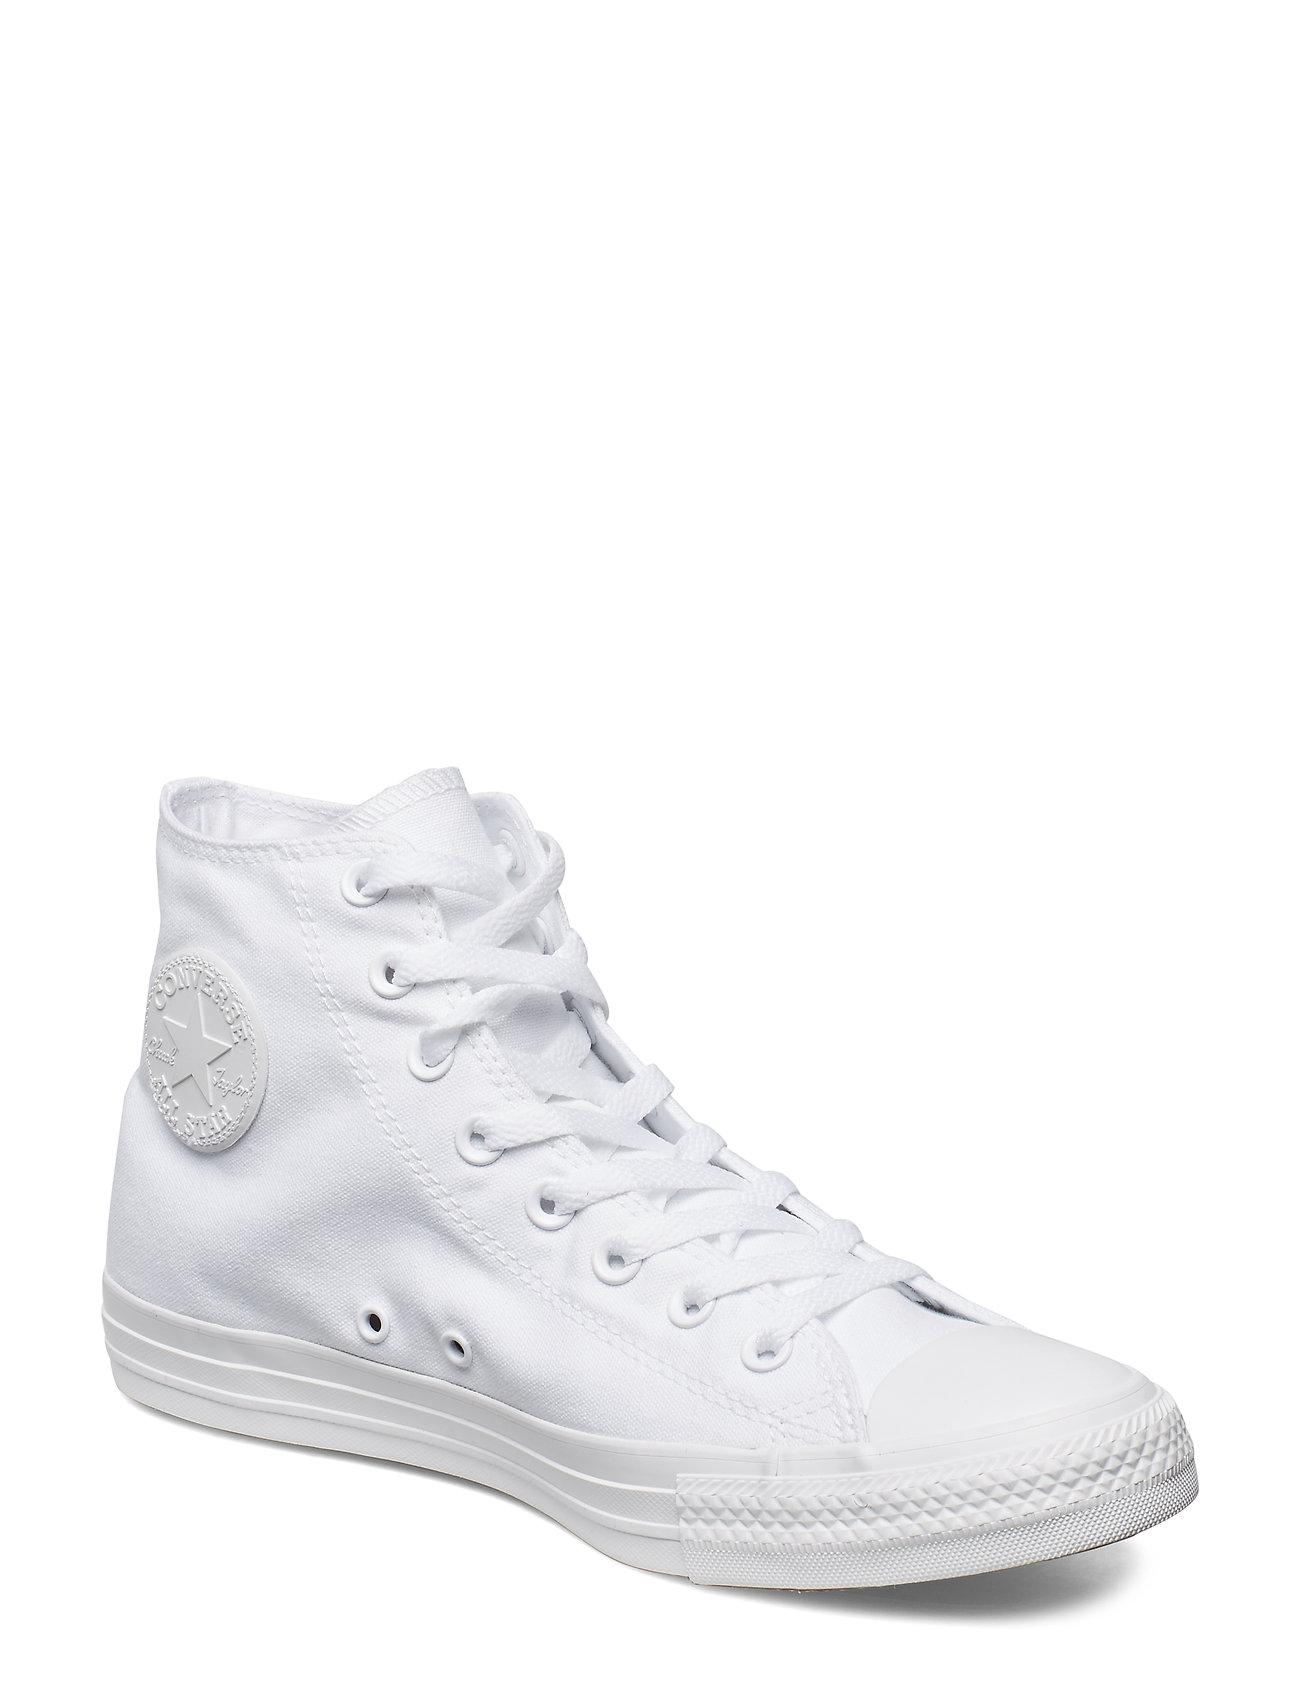 Converse All Star Specialty Hi - WHITE MONOCHROME